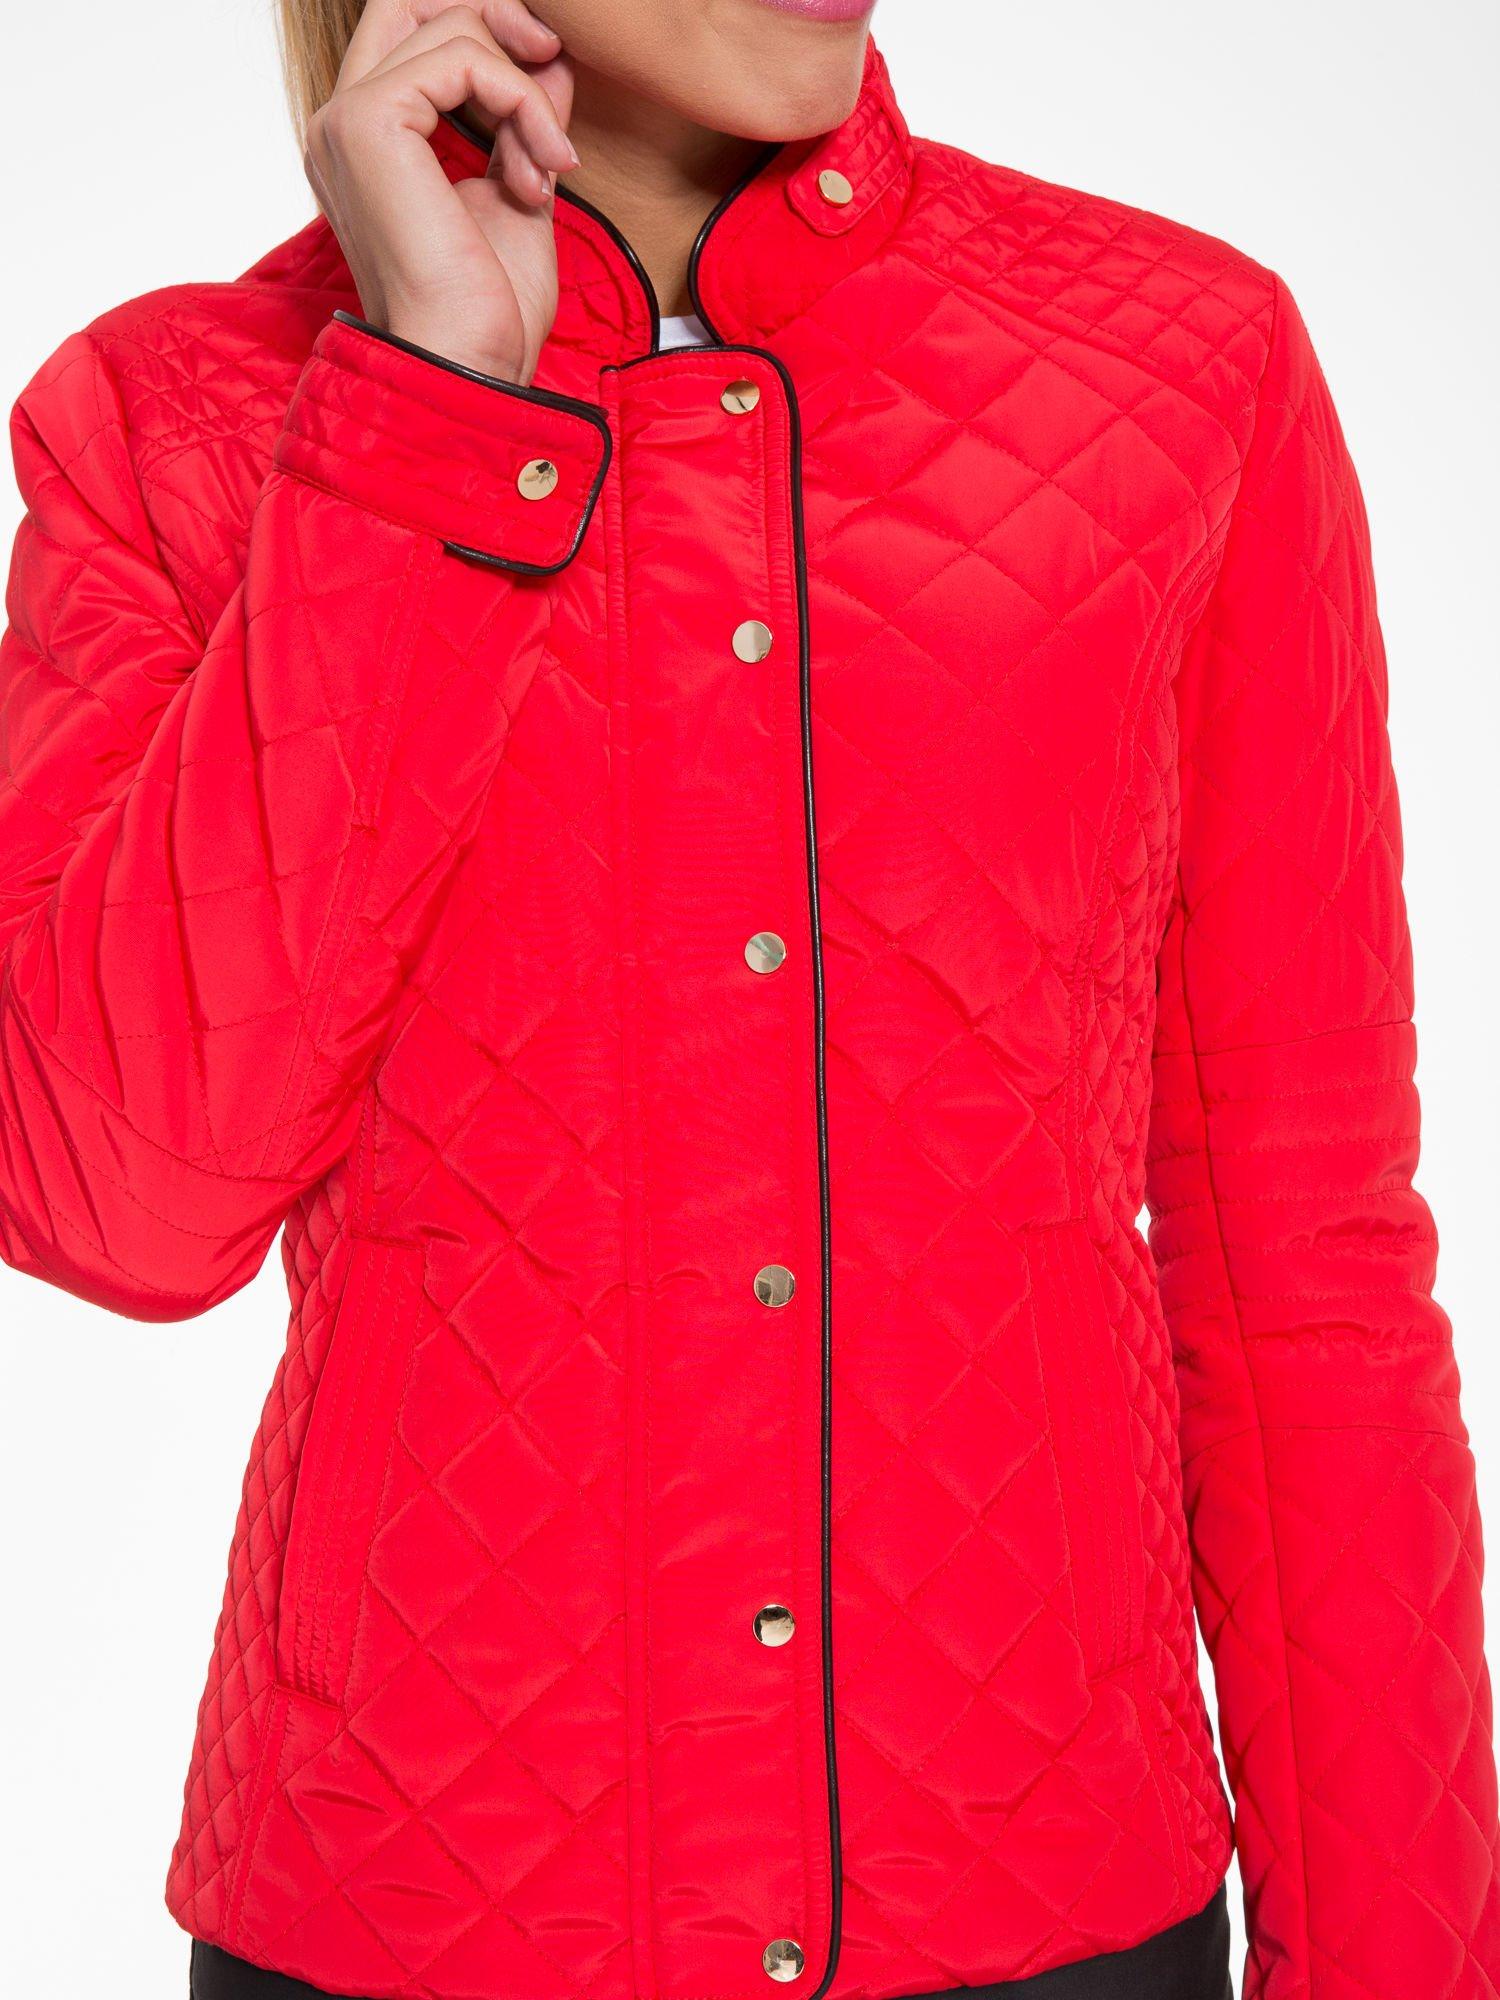 Czerwona pikowana kurtka ze skórzaną lamówką                                  zdj.                                  9